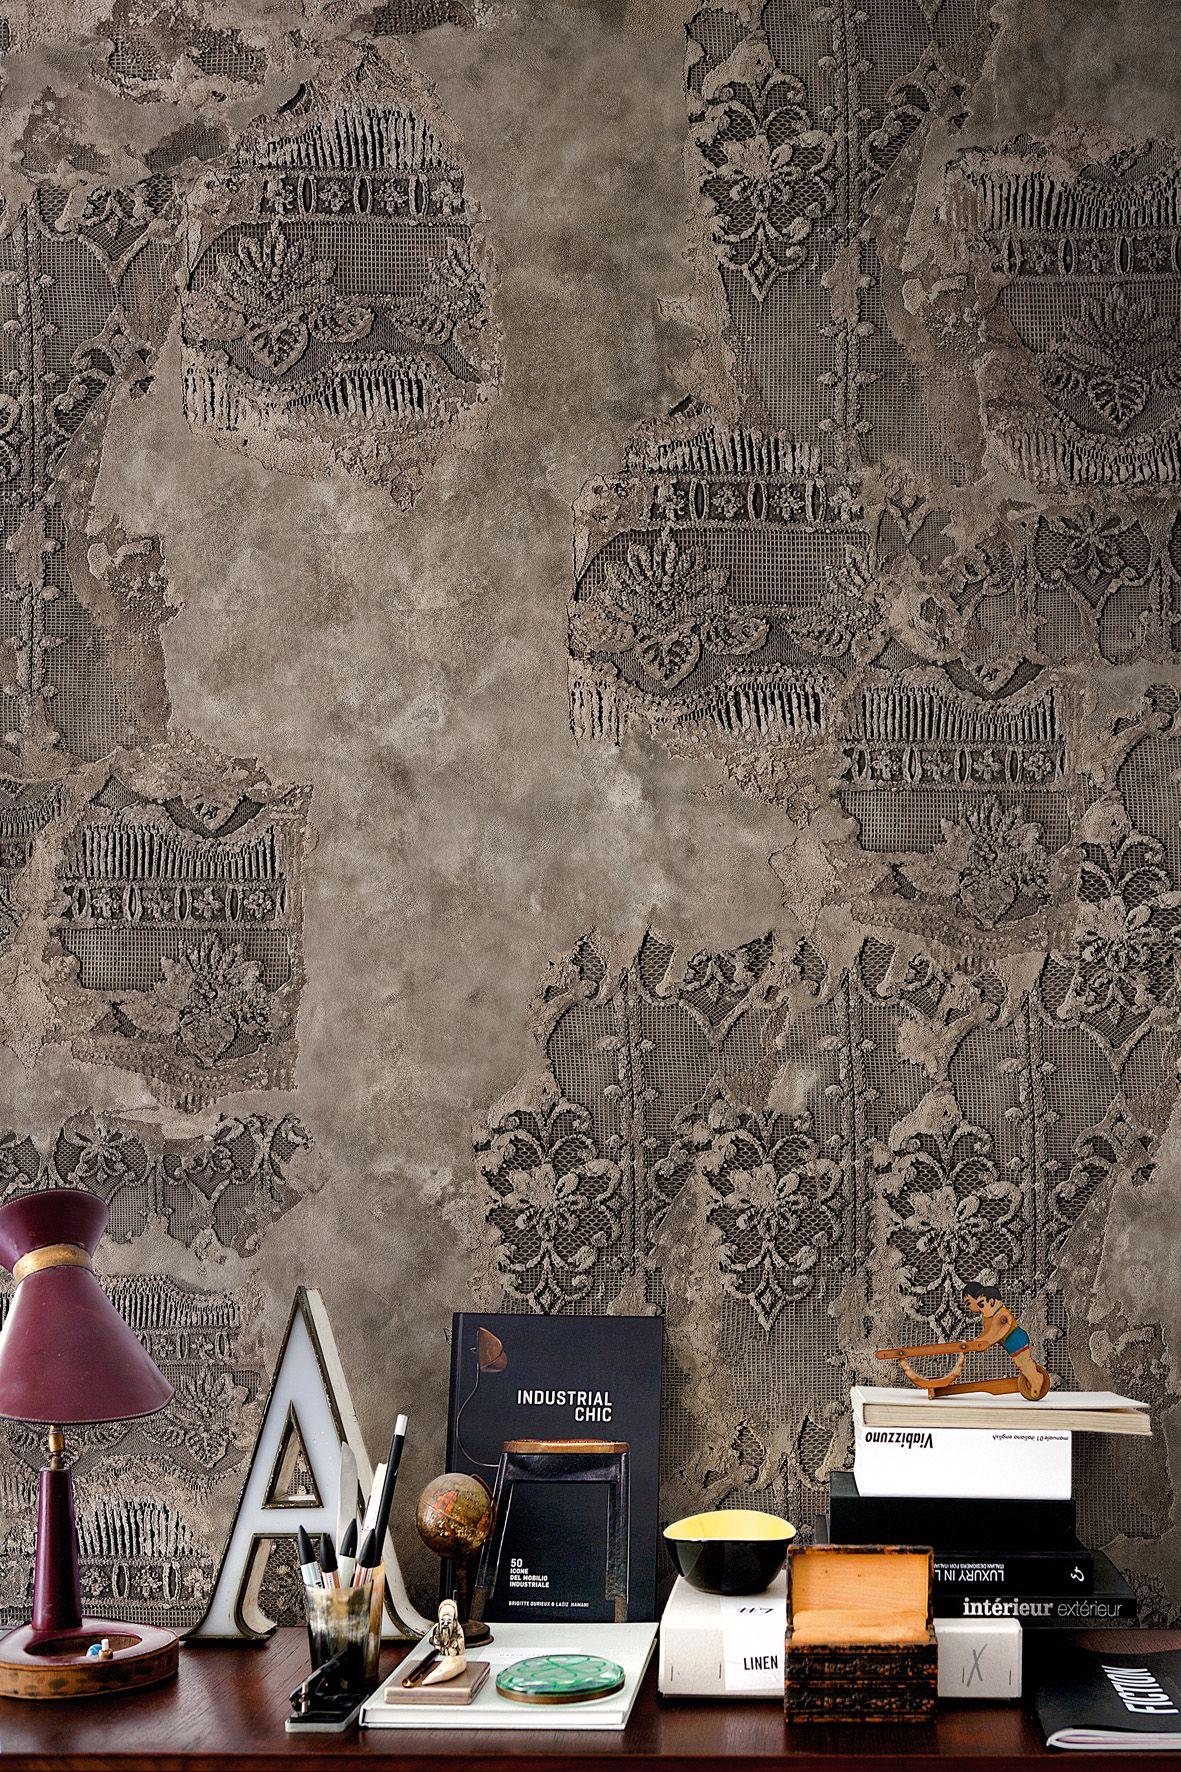 wall effect wallpaper sangallo by wall dec design. Black Bedroom Furniture Sets. Home Design Ideas